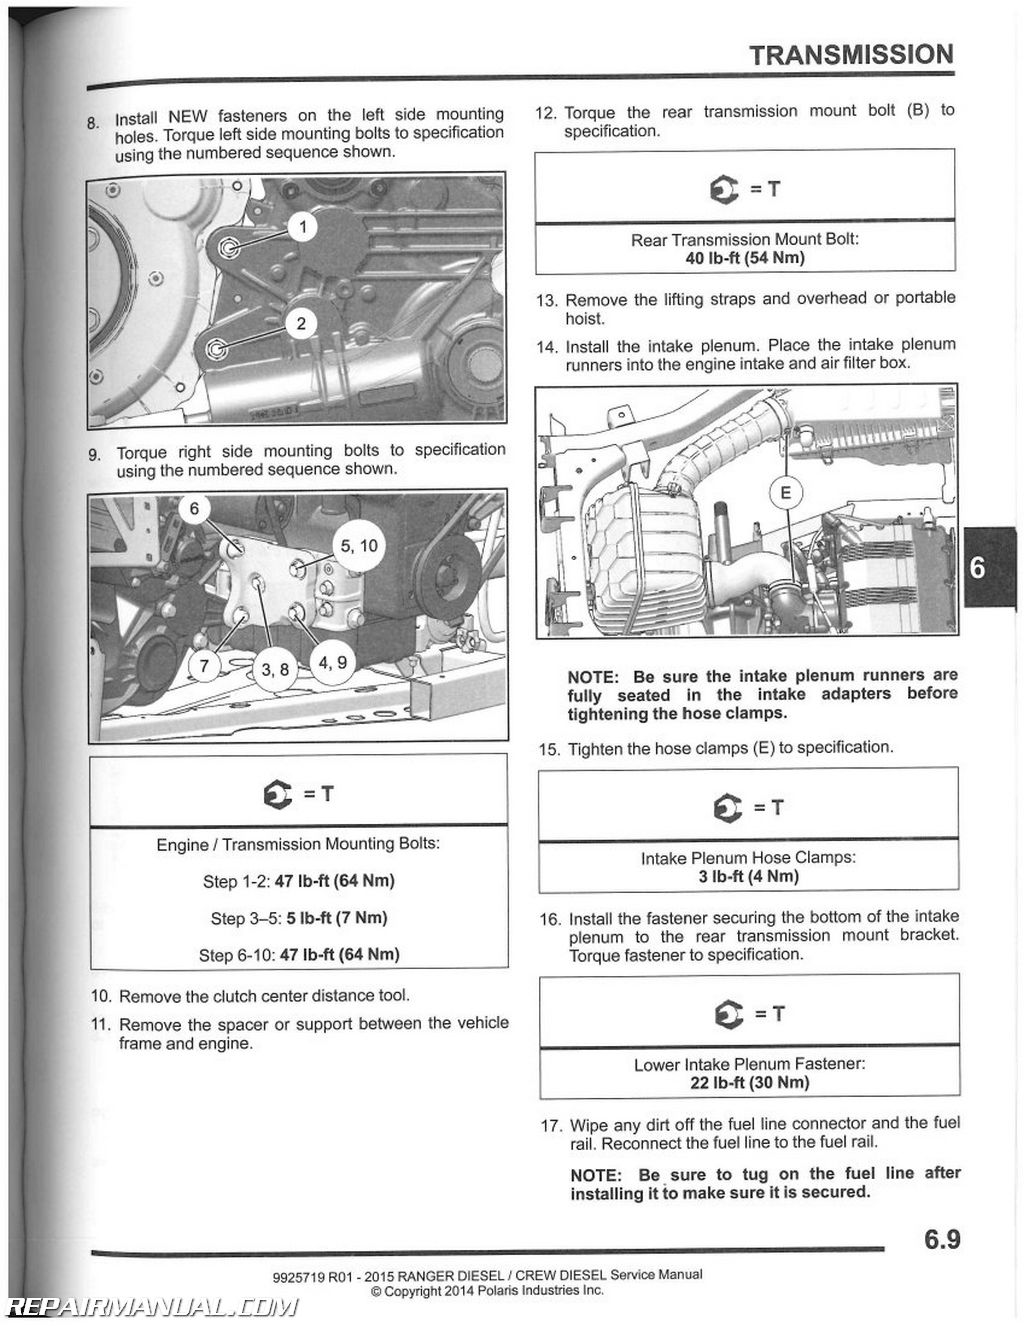 polaris utv manual rh polaris utv manual mollysmenu us 2007 polaris ranger service manual download 2007 polaris ranger 6x6 service manual